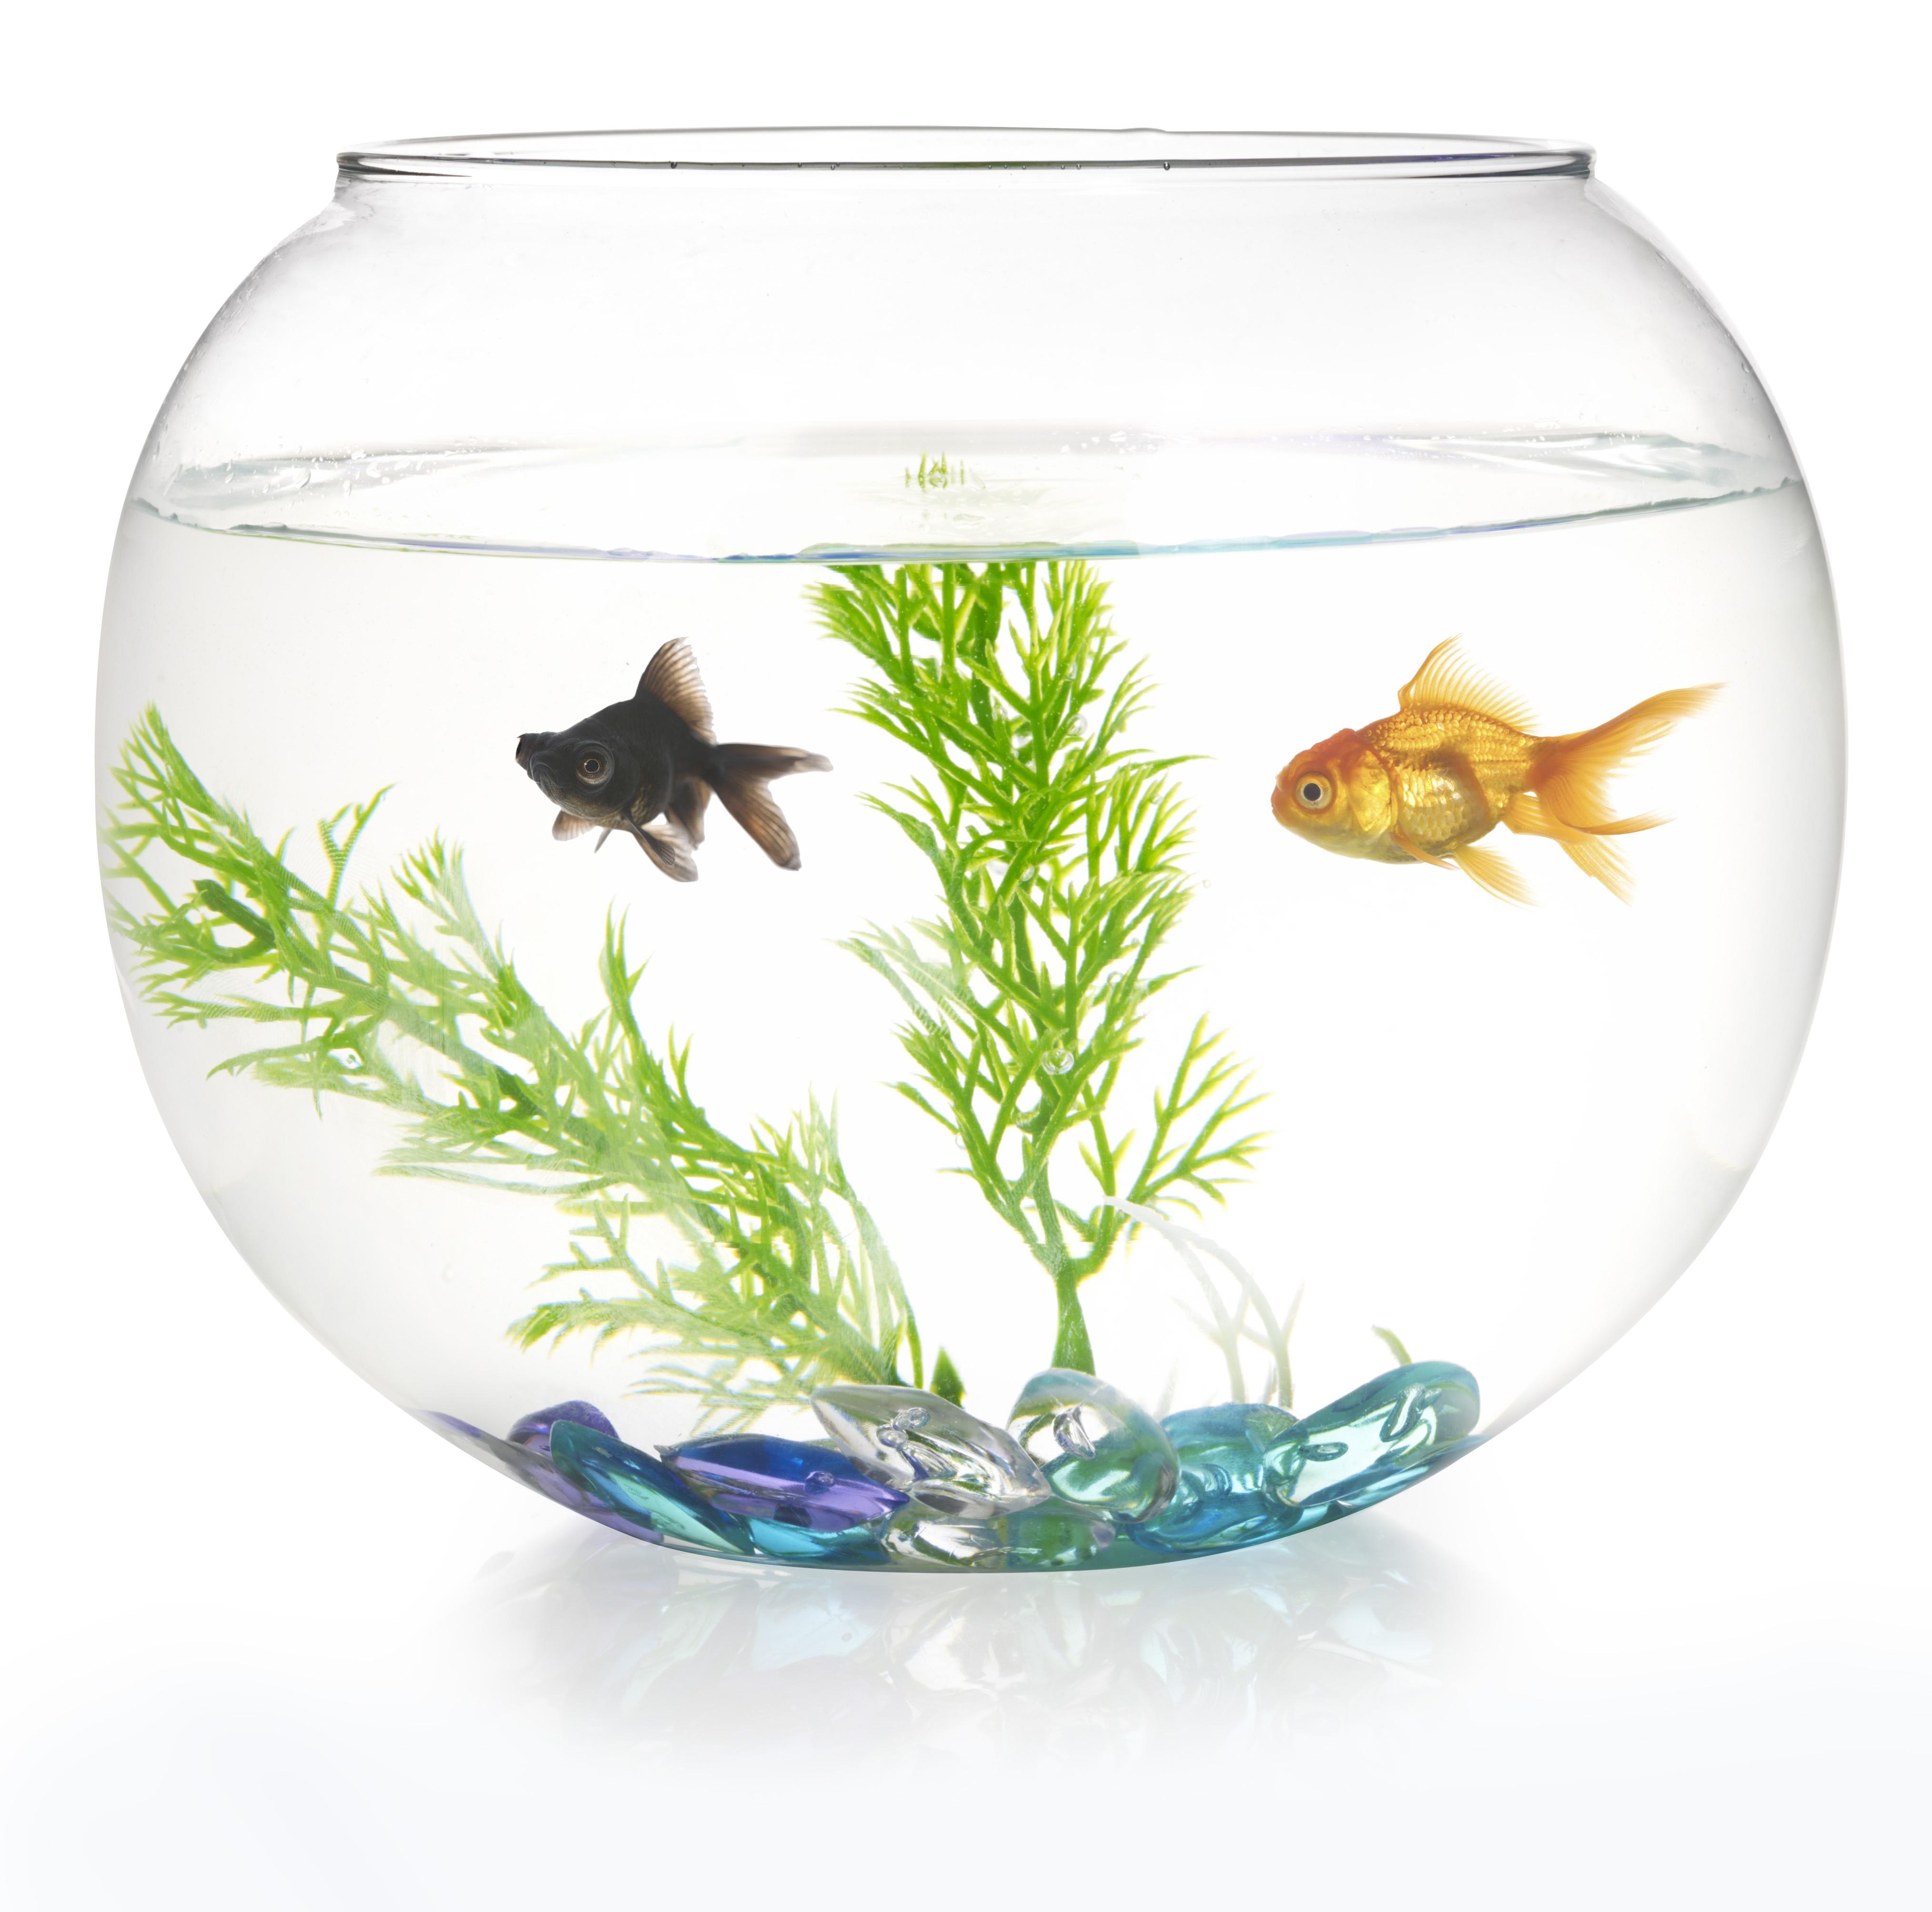 Fish bowl girl video — photo 2